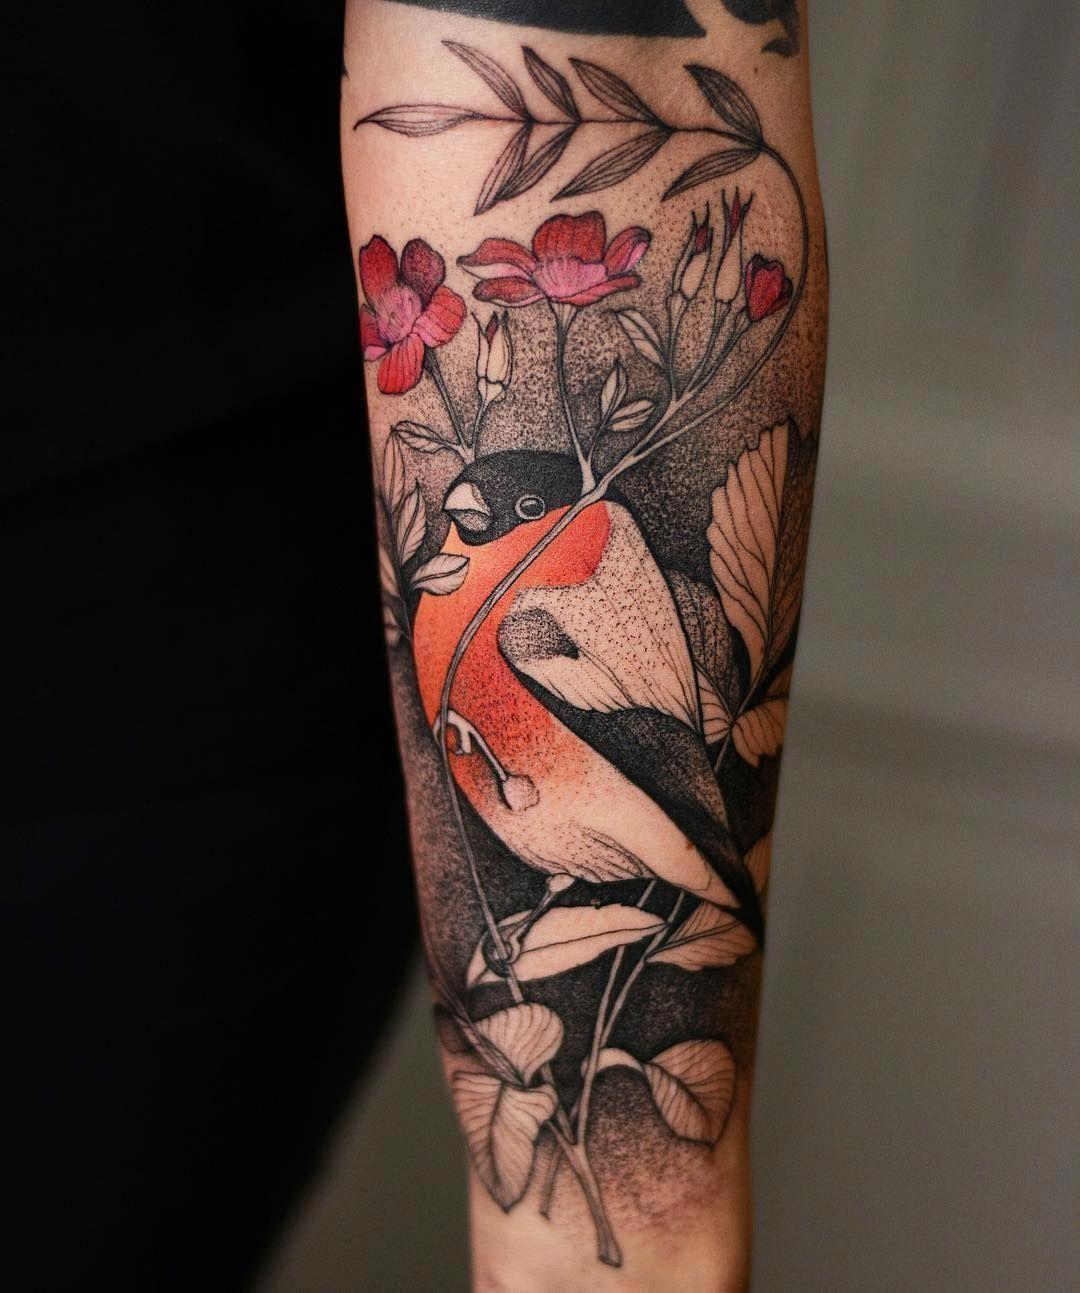 Easy Half Sleeve Tattoos In 2020 Fairy Tattoo Half Sleeve Tattoo Tattoo Shading